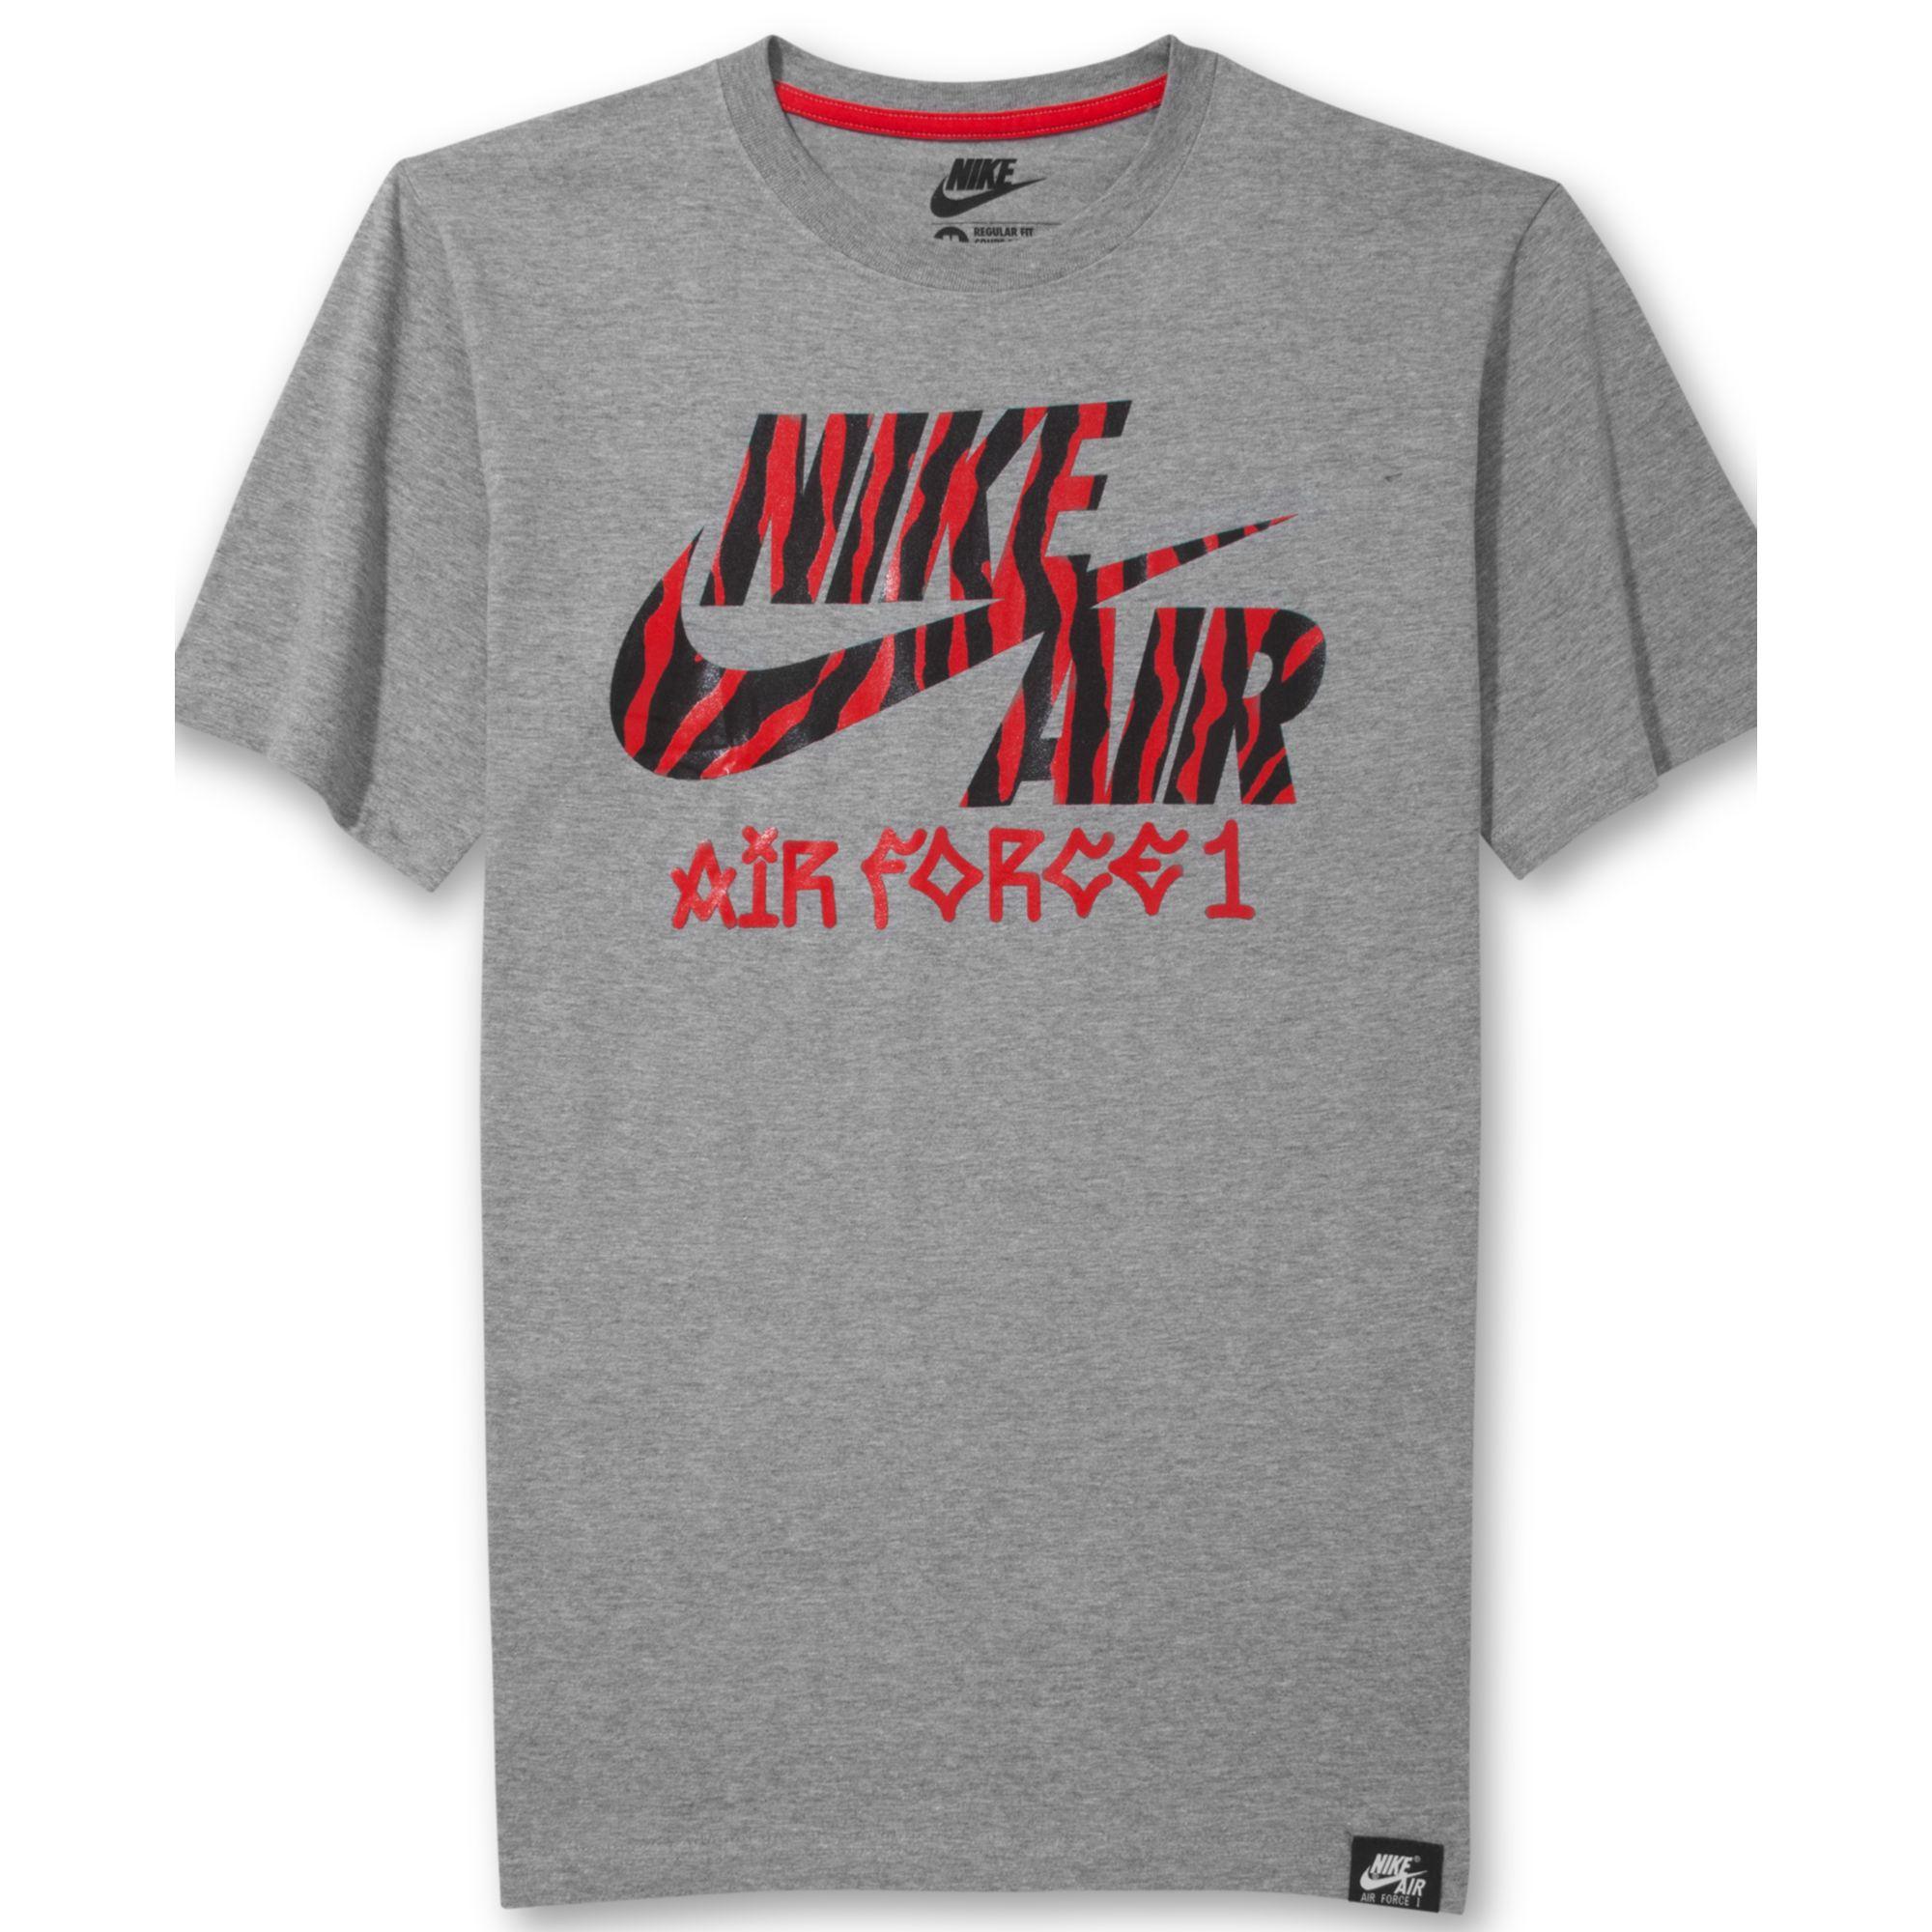 baf5460b7b93 Leopard Print Nike T Shirt « Alzheimer's Network of Oregon